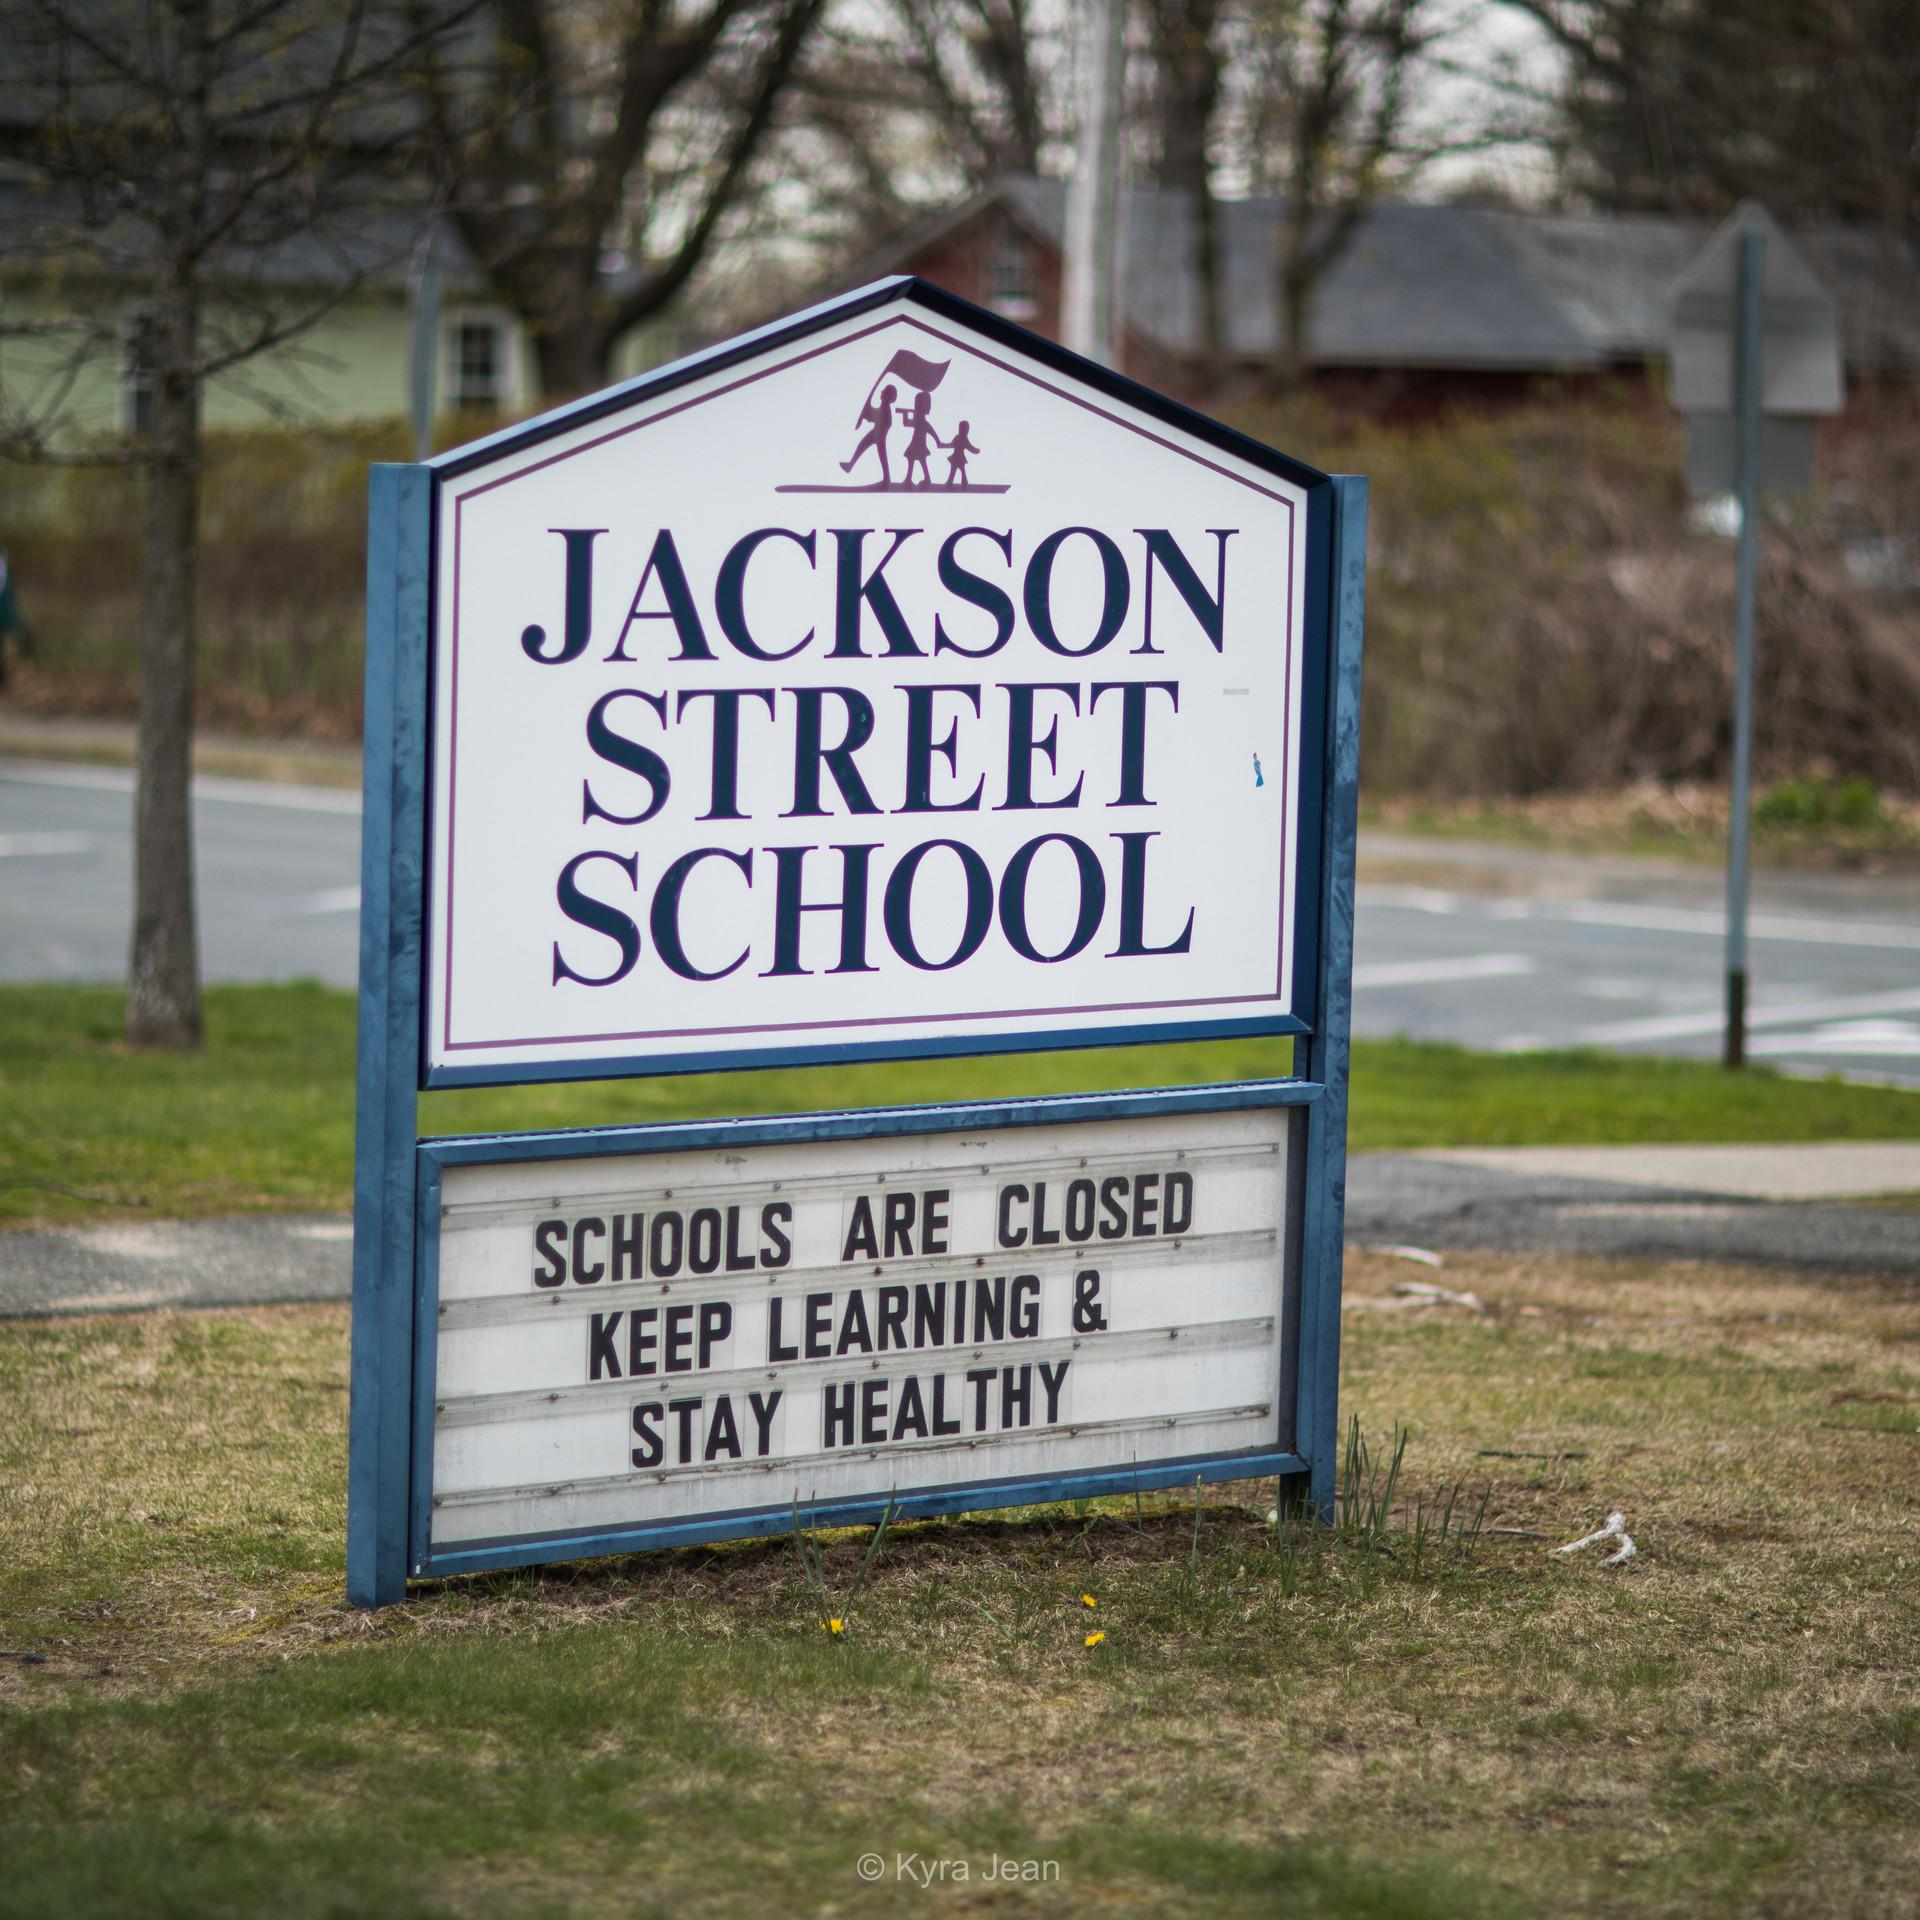 Schools are closed